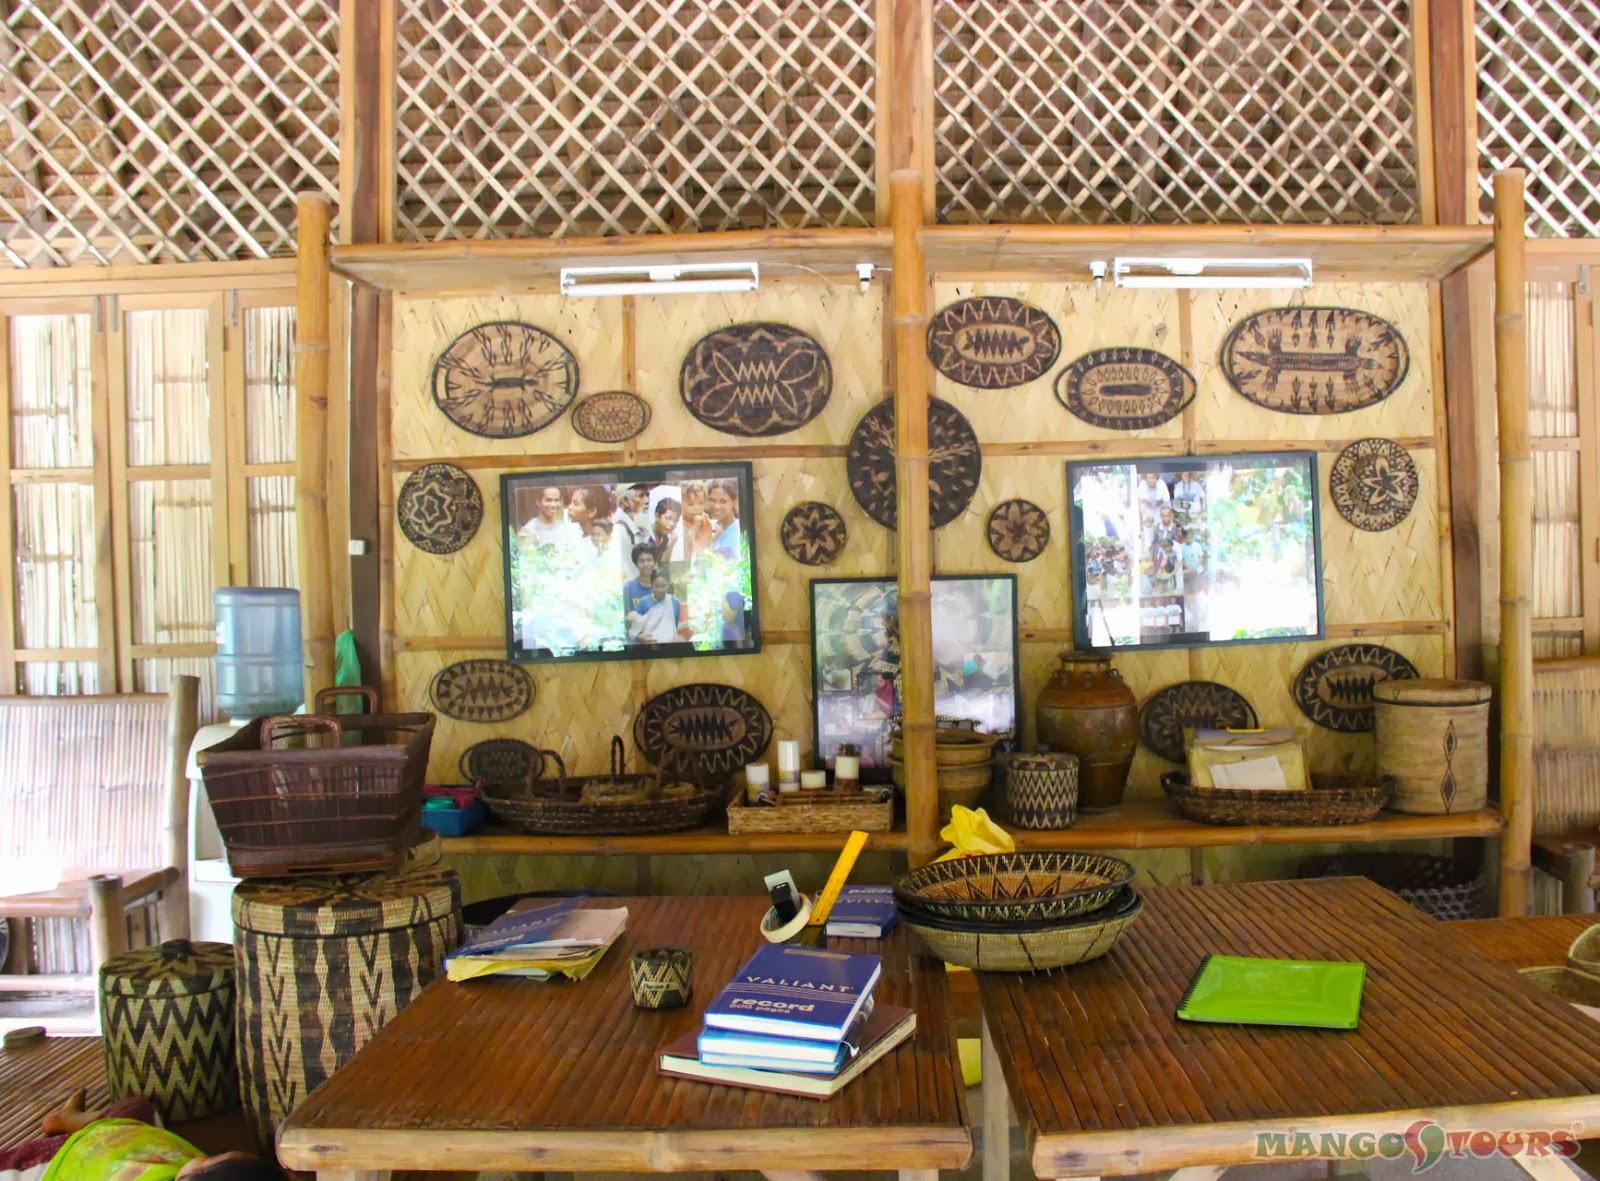 Puerto Galera Buri Resort & Spa Mango Tours Philippines Mangyan Village Nito weaving souvenirs